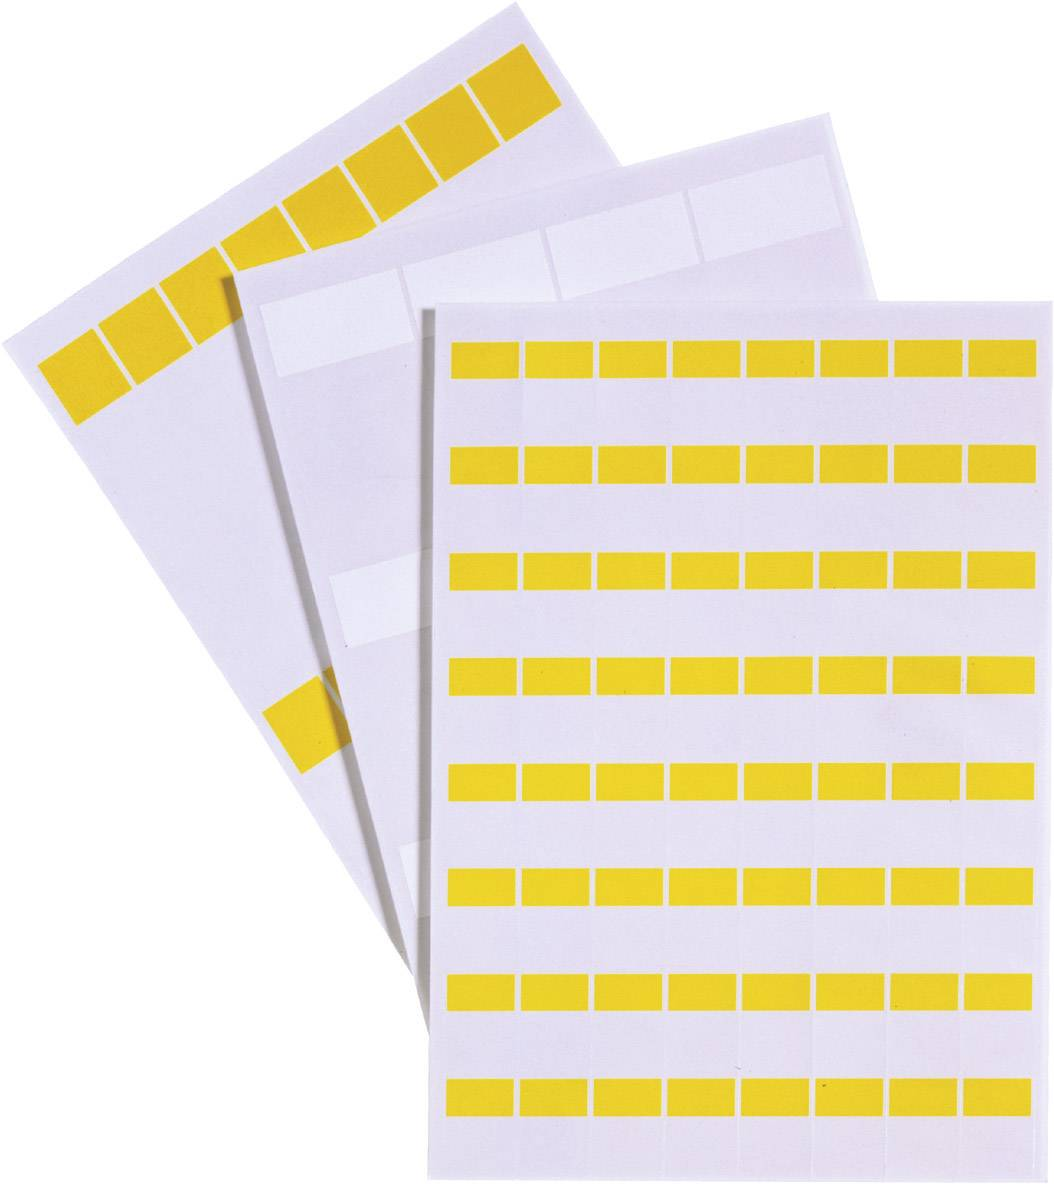 Etikety LappKabel LCK-65 WH (83256153), bílá